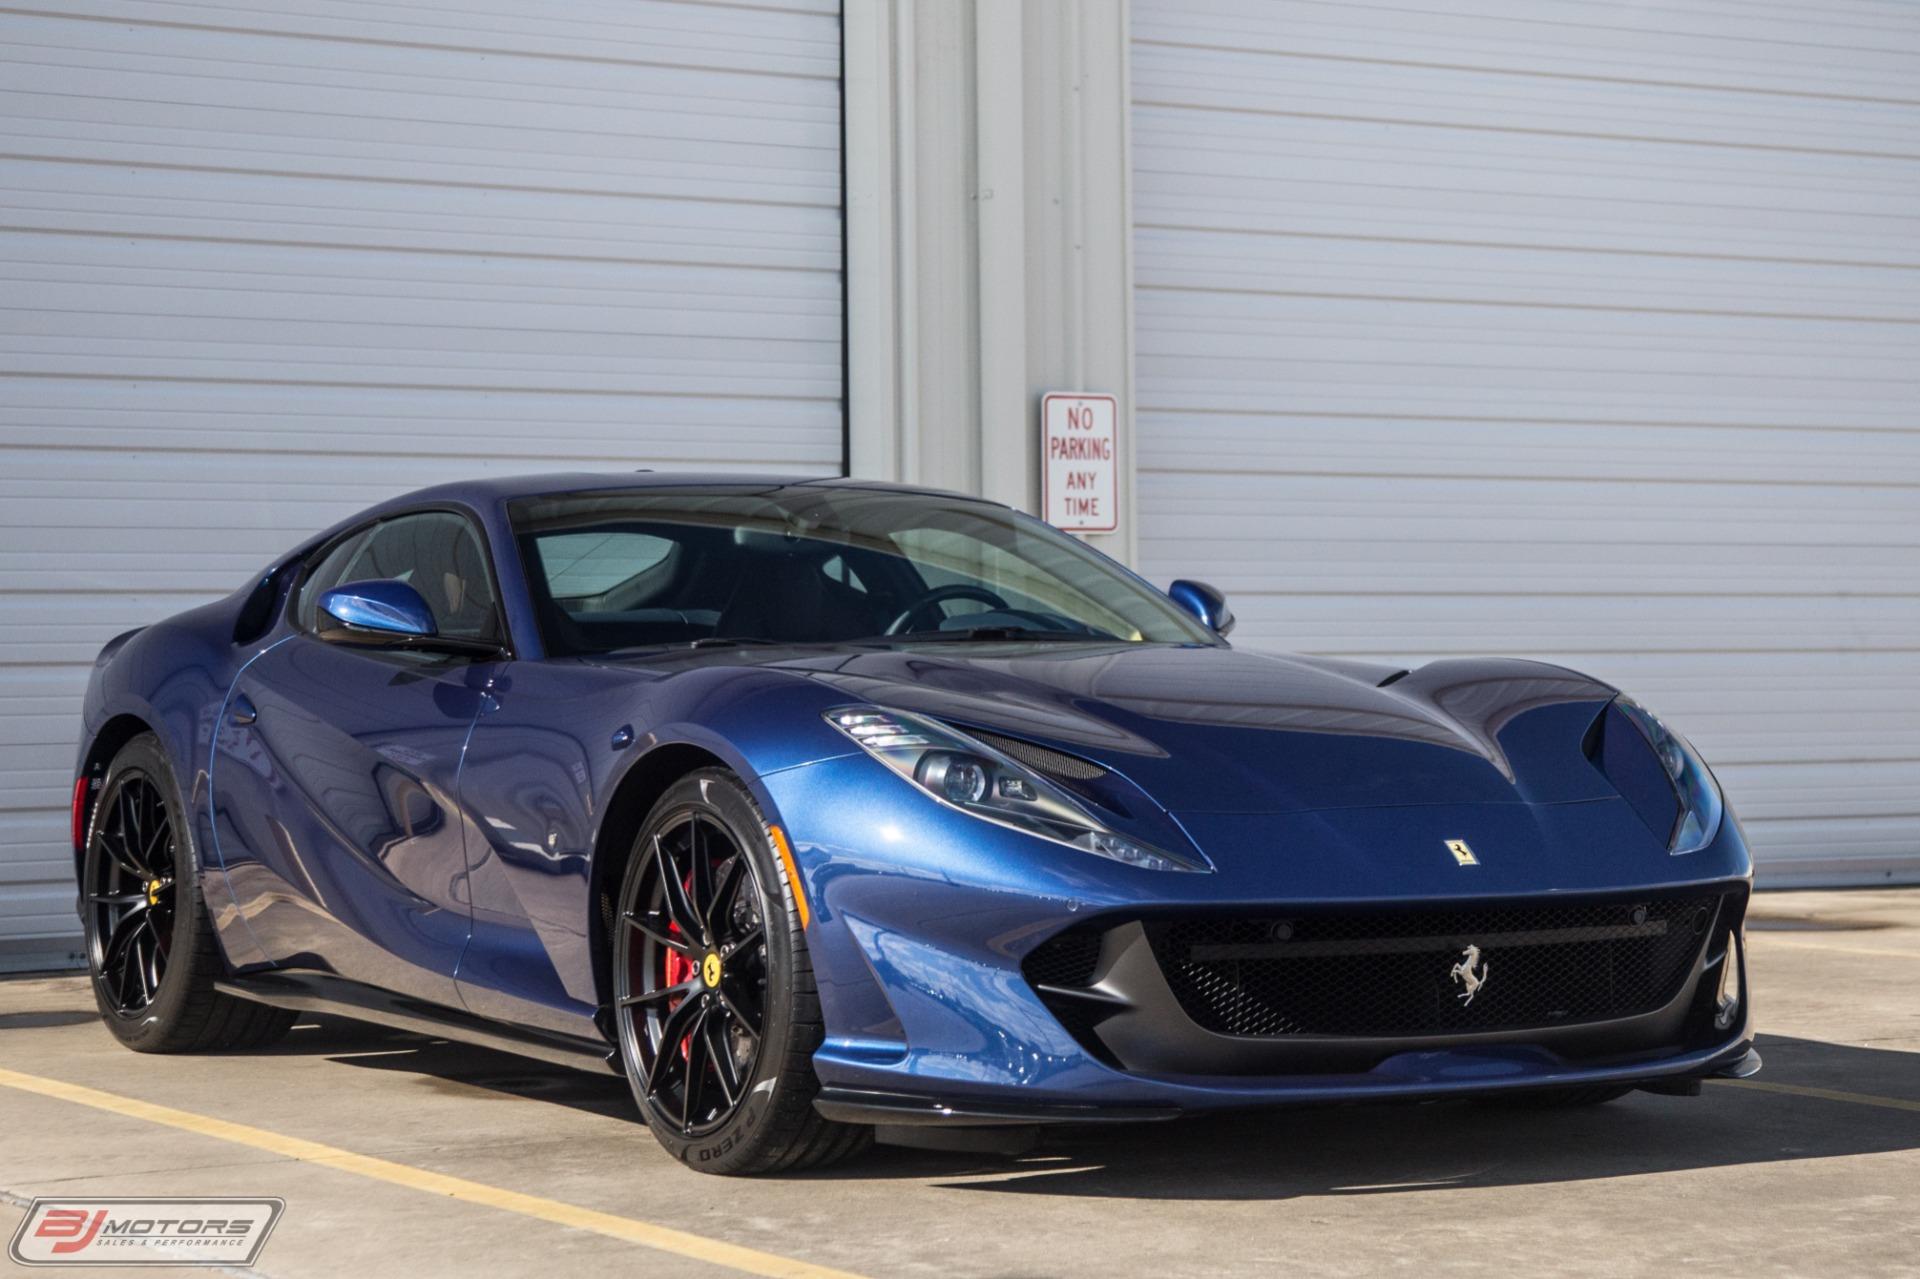 Used 2018 Ferrari 812 Superfast Tdf Blue W Blue Sterling